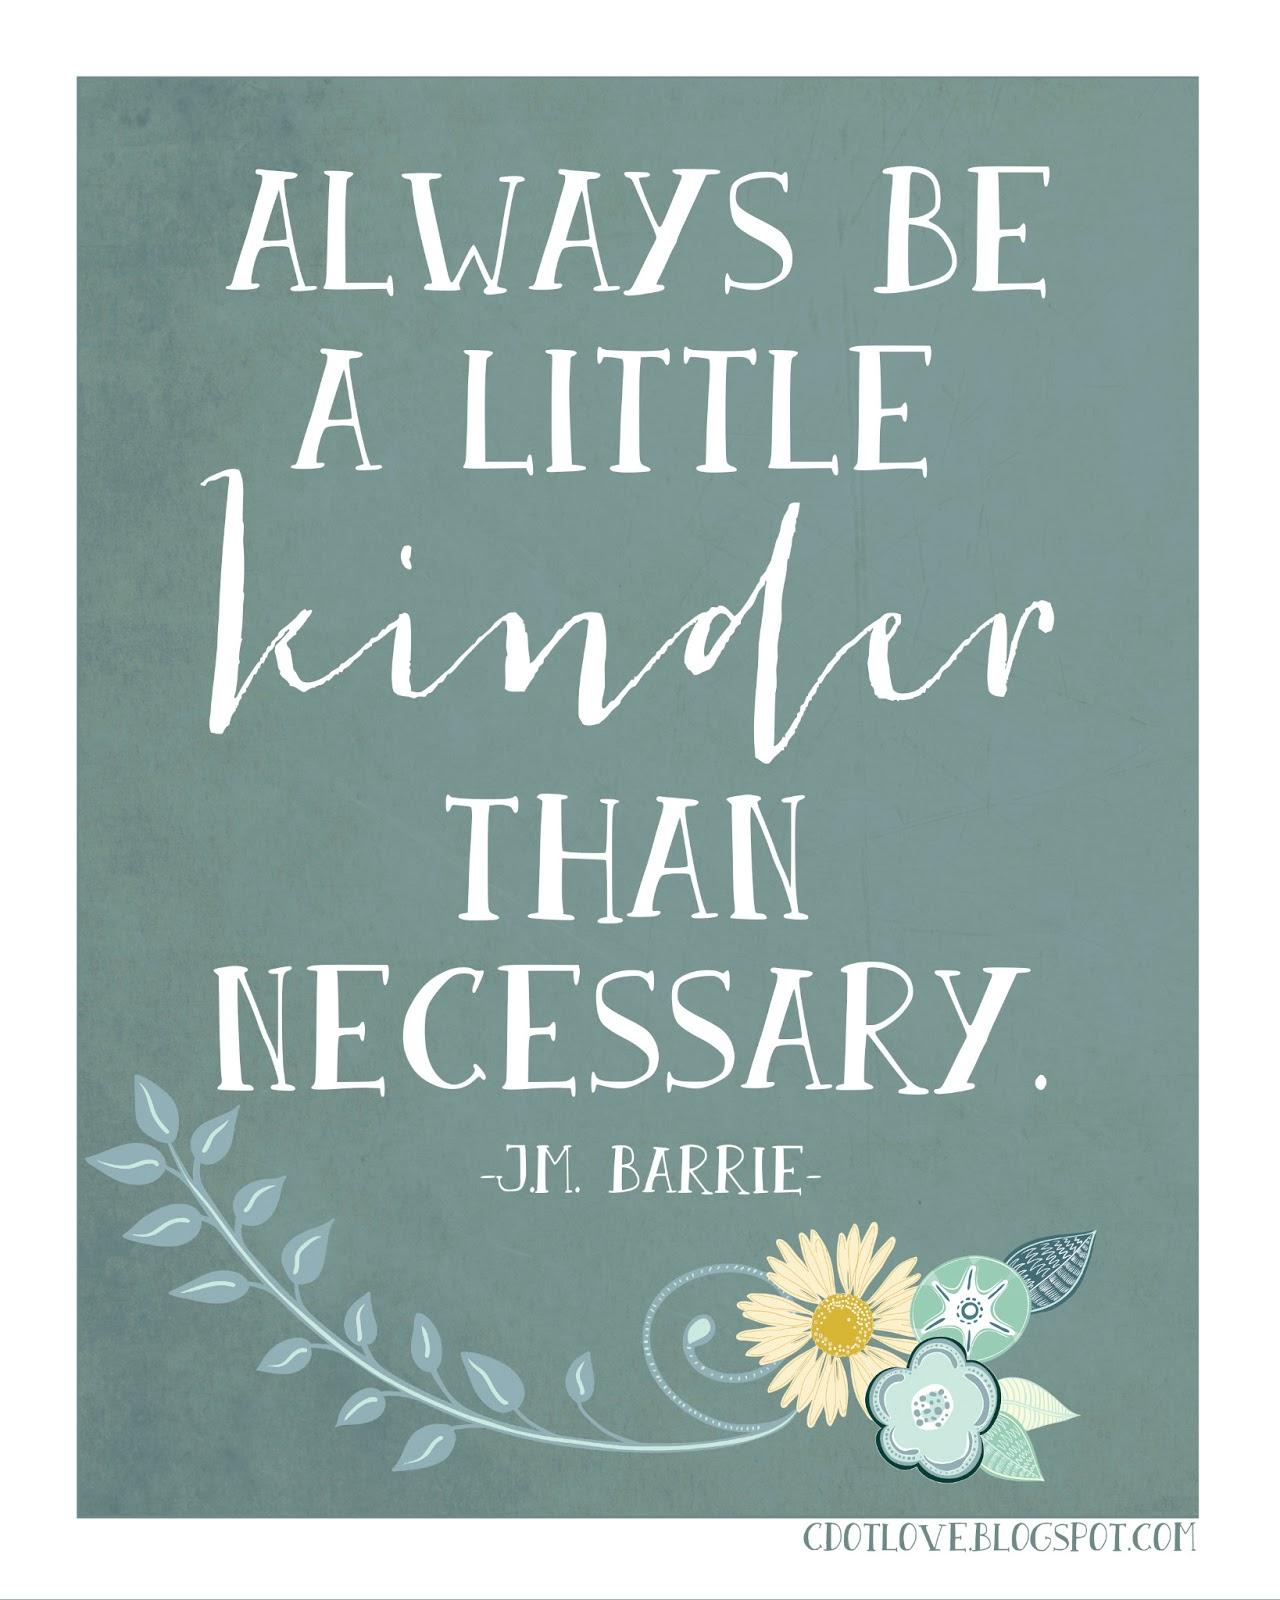 CdotLove Design { By Kristin Clove }: Kindness { With Free